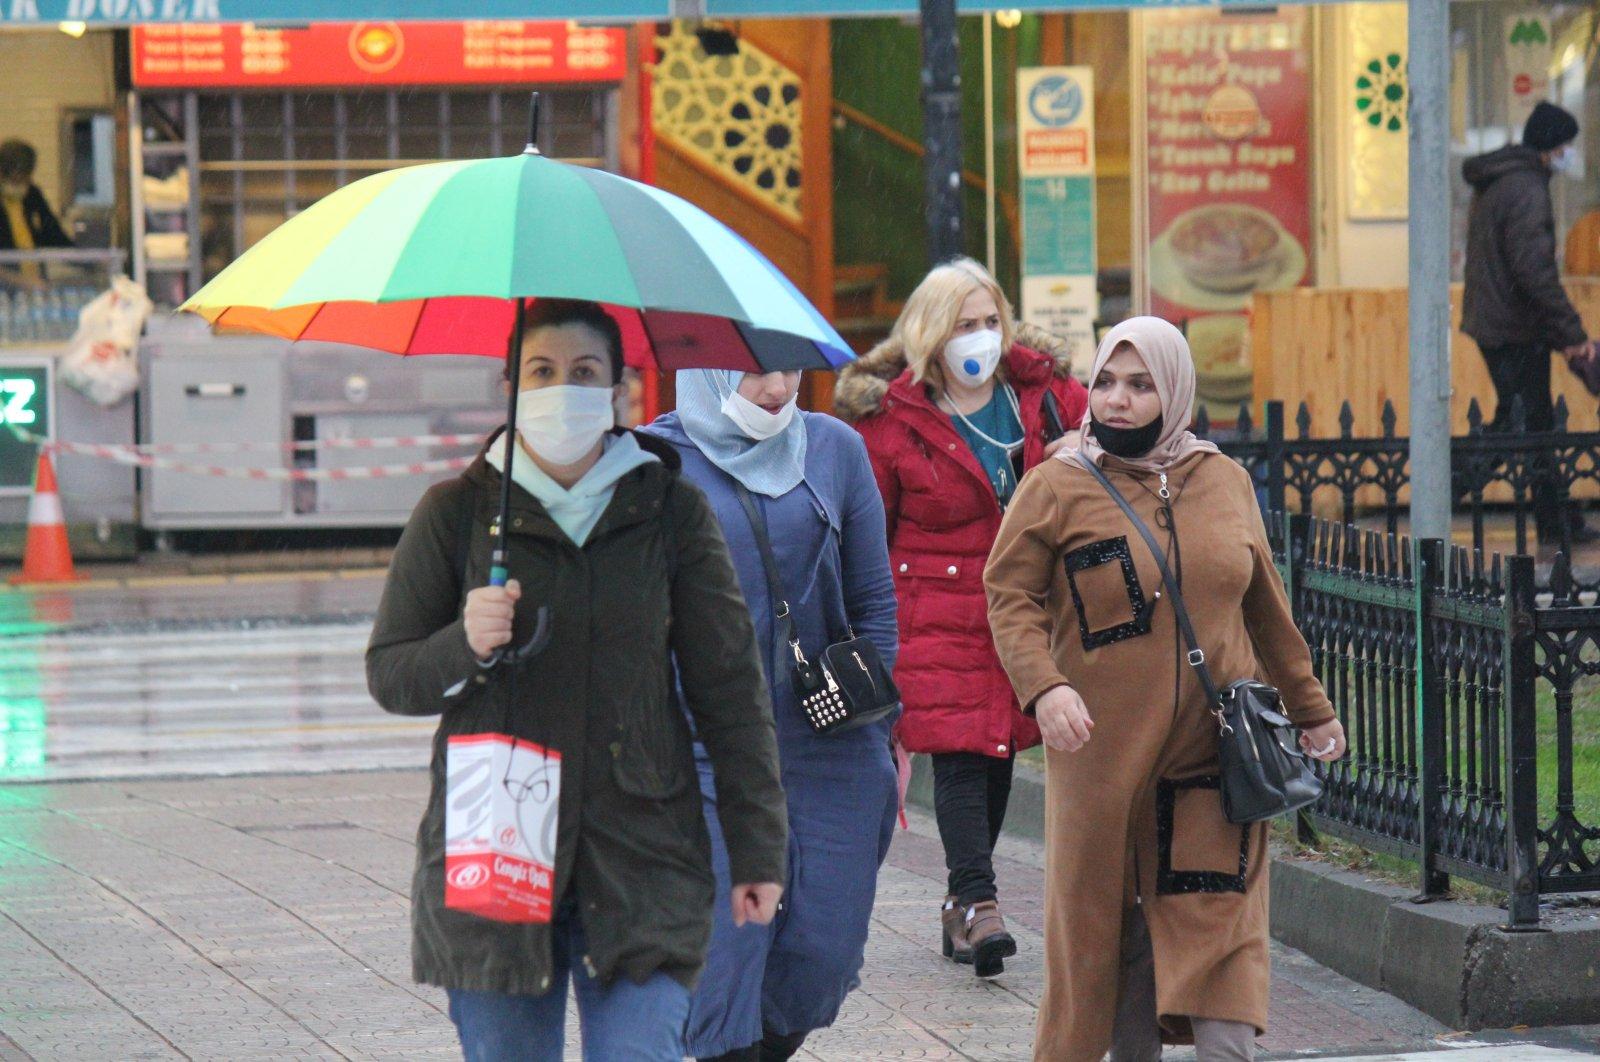 People take a walk in northern Samsun province's İlkadım district on Nov. 18, 2020. (IHA Photo)